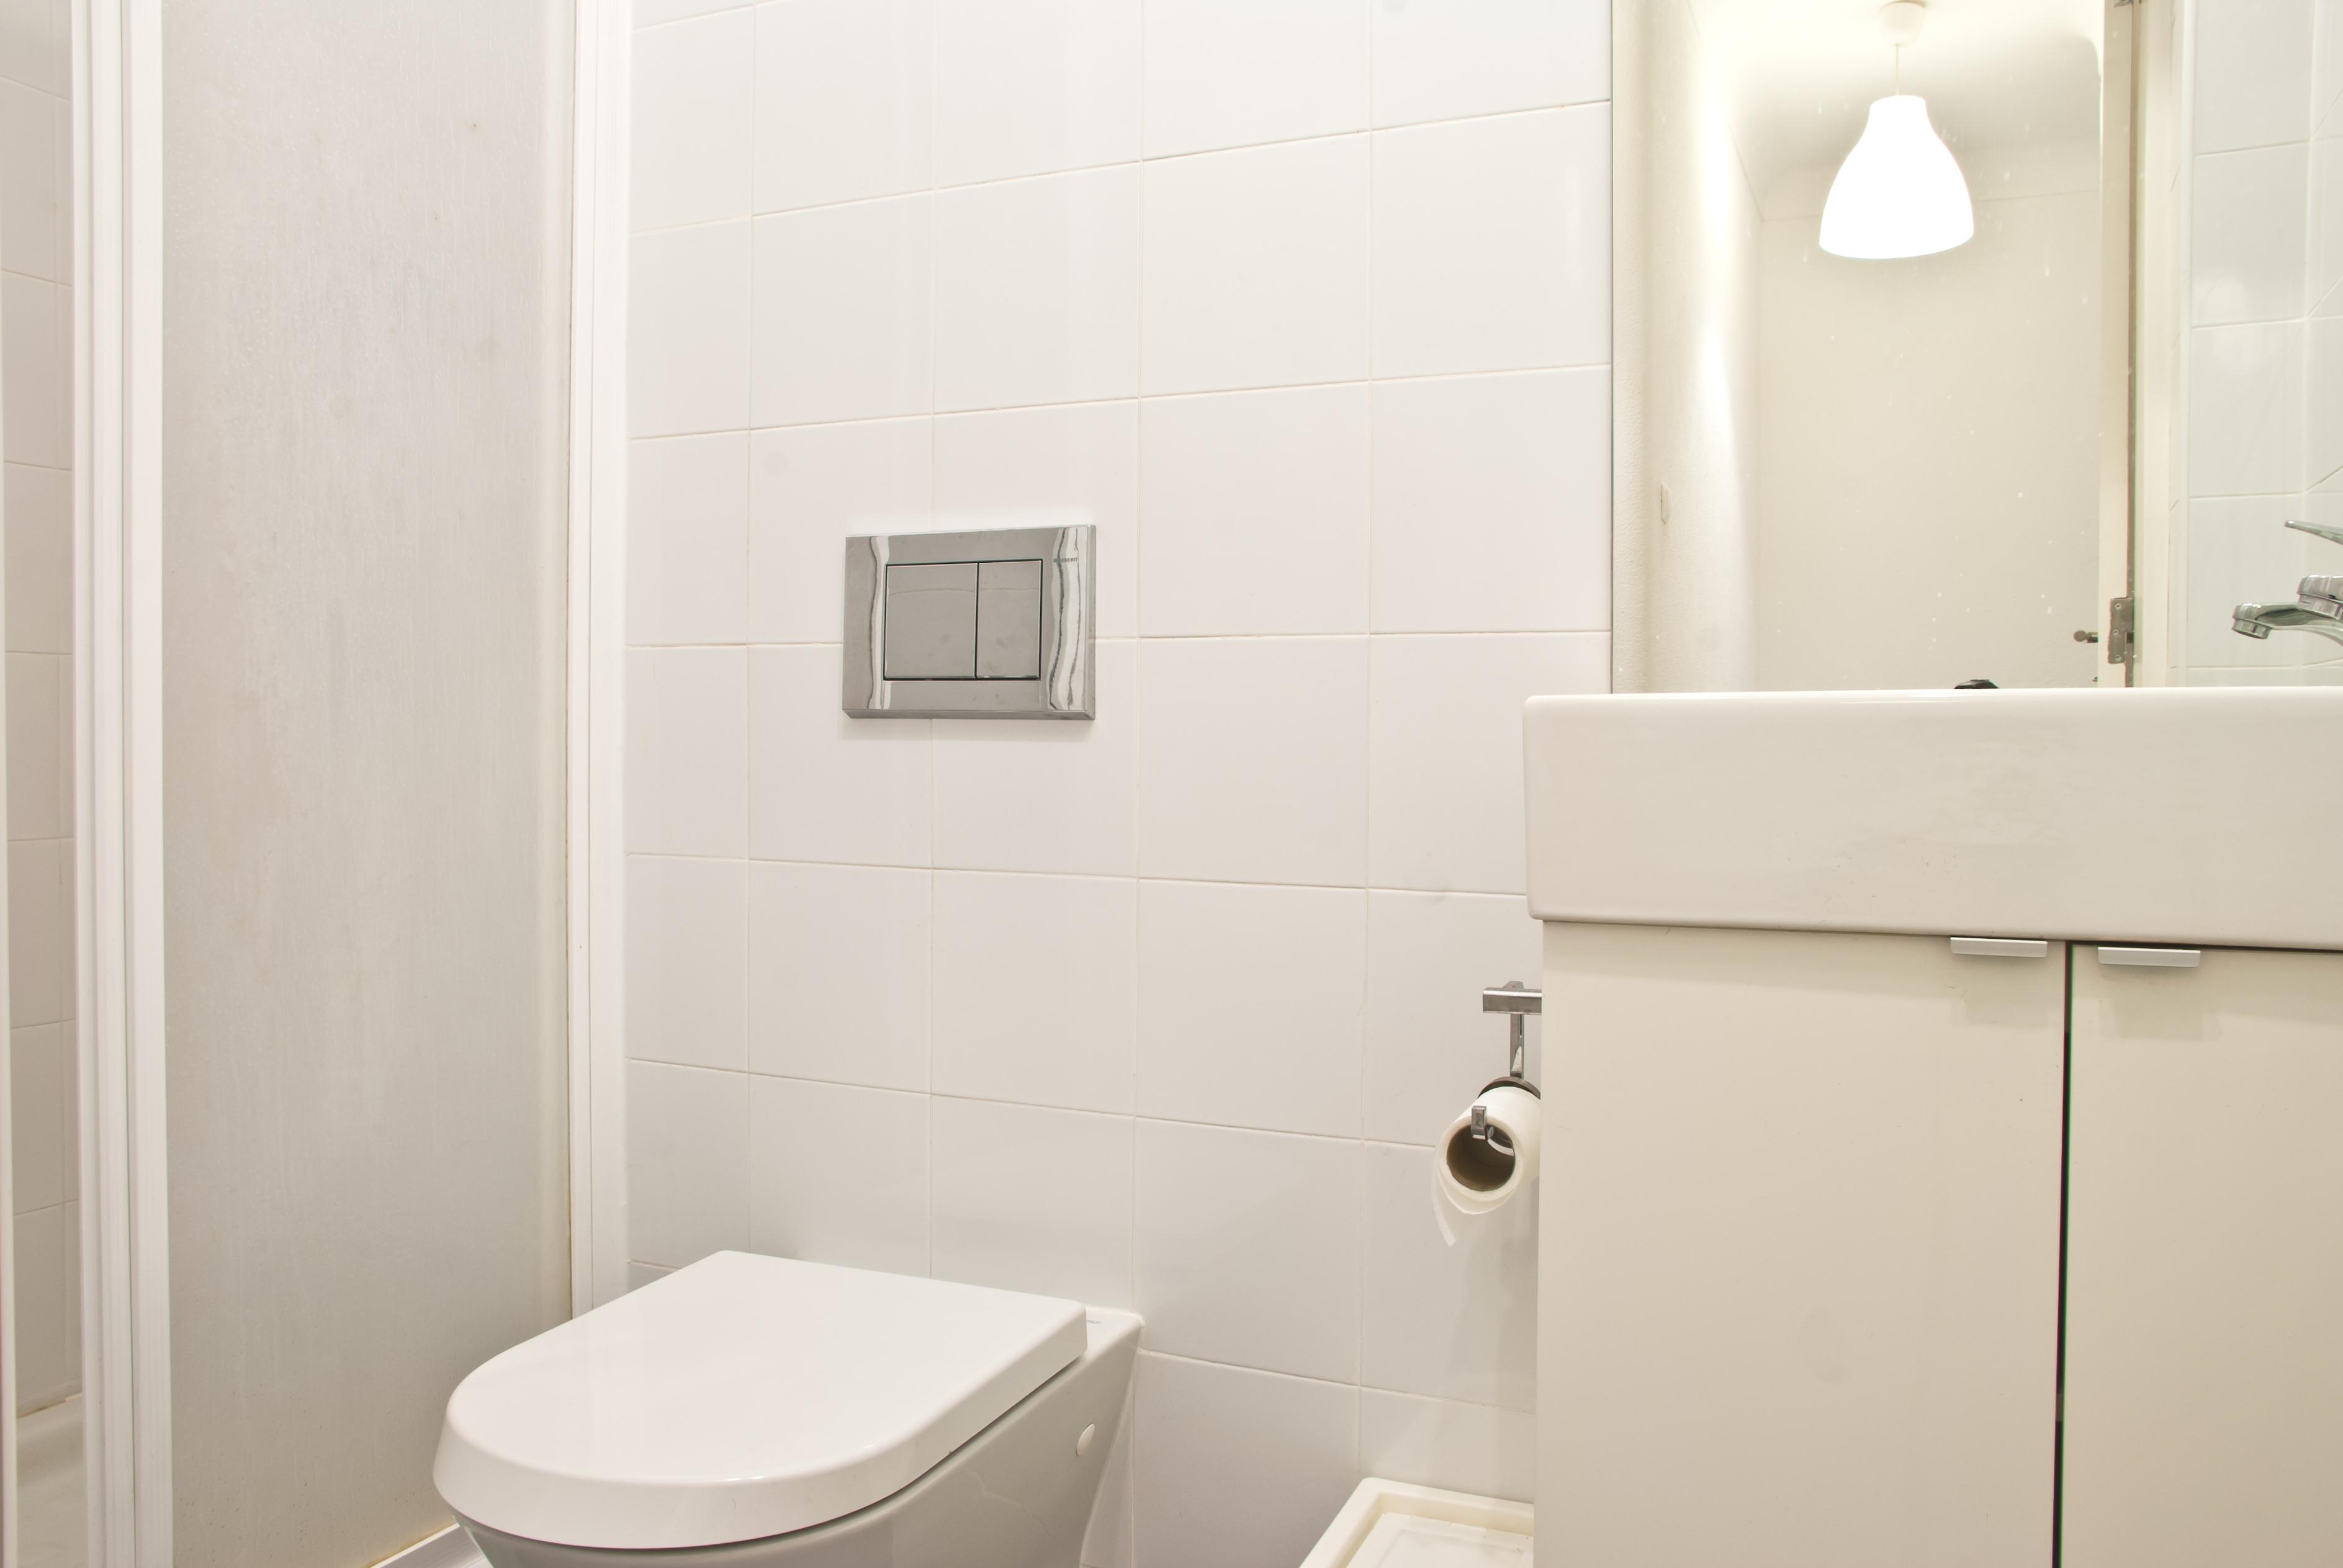 GJ - Bathroom nº2 - Quartos.Rooms nº1, 5, 6 - Foto 2.jpg